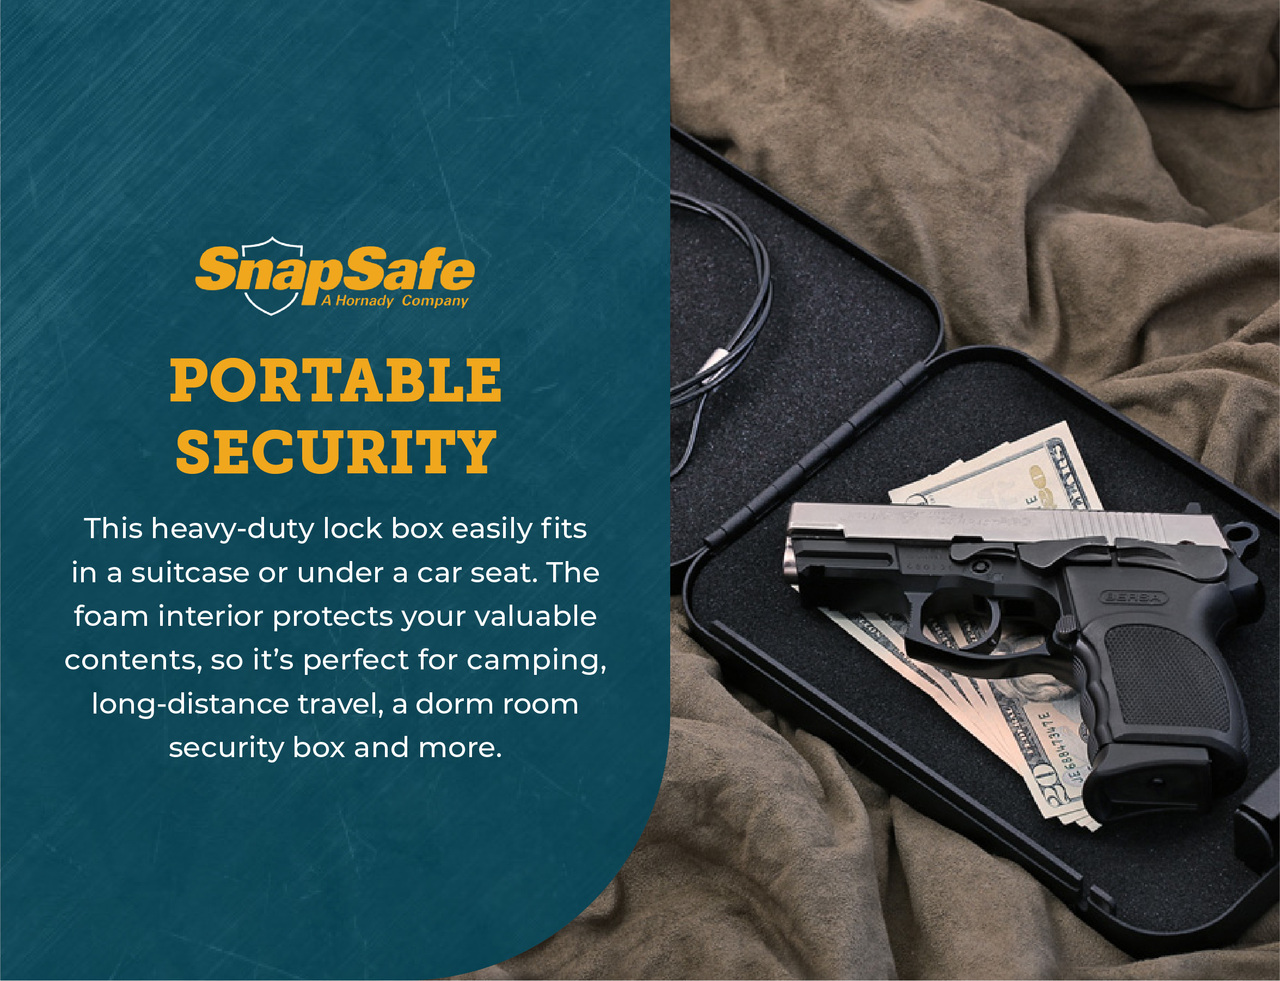 https://d3d71ba2asa5oz.cloudfront.net/23000296/images/snapsafe-lockbox-with-key-lock-for-handgun-storage-of-full-size-pistols-casku18174-2.jpg